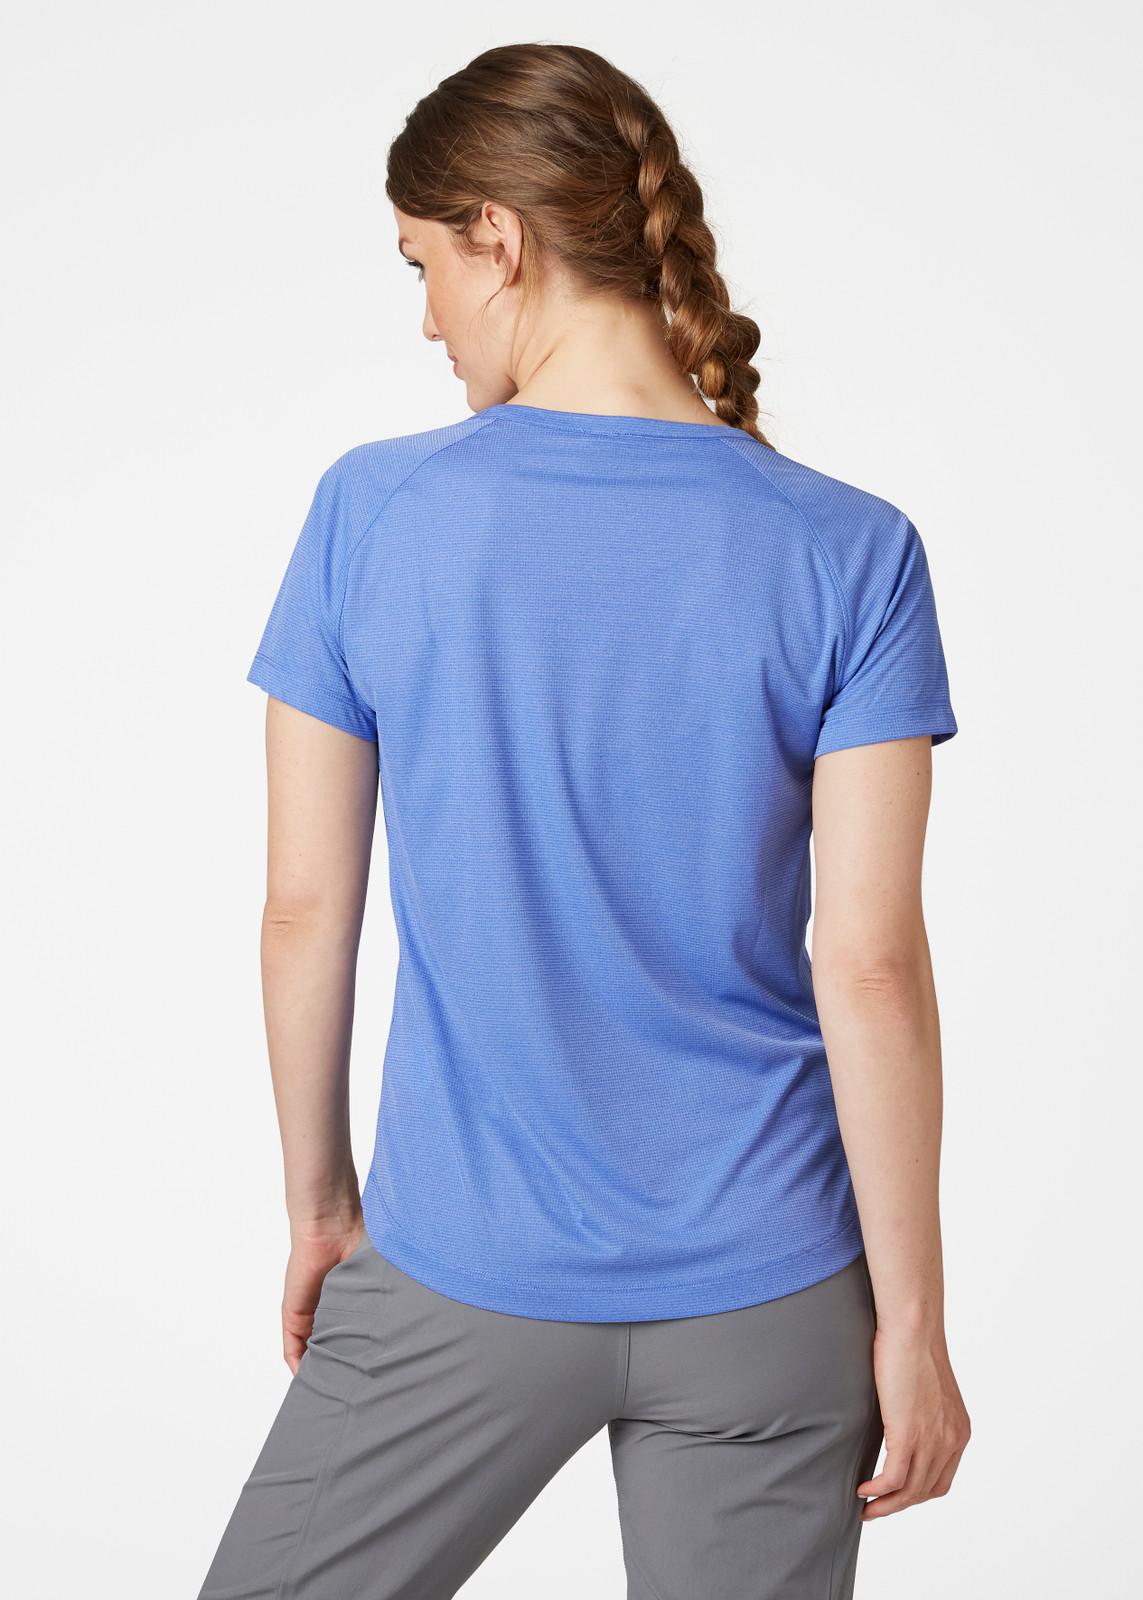 Helly Hansen Verglas Pace T-Shirt, Women's - Royal Blue, 62967-514 back - on model